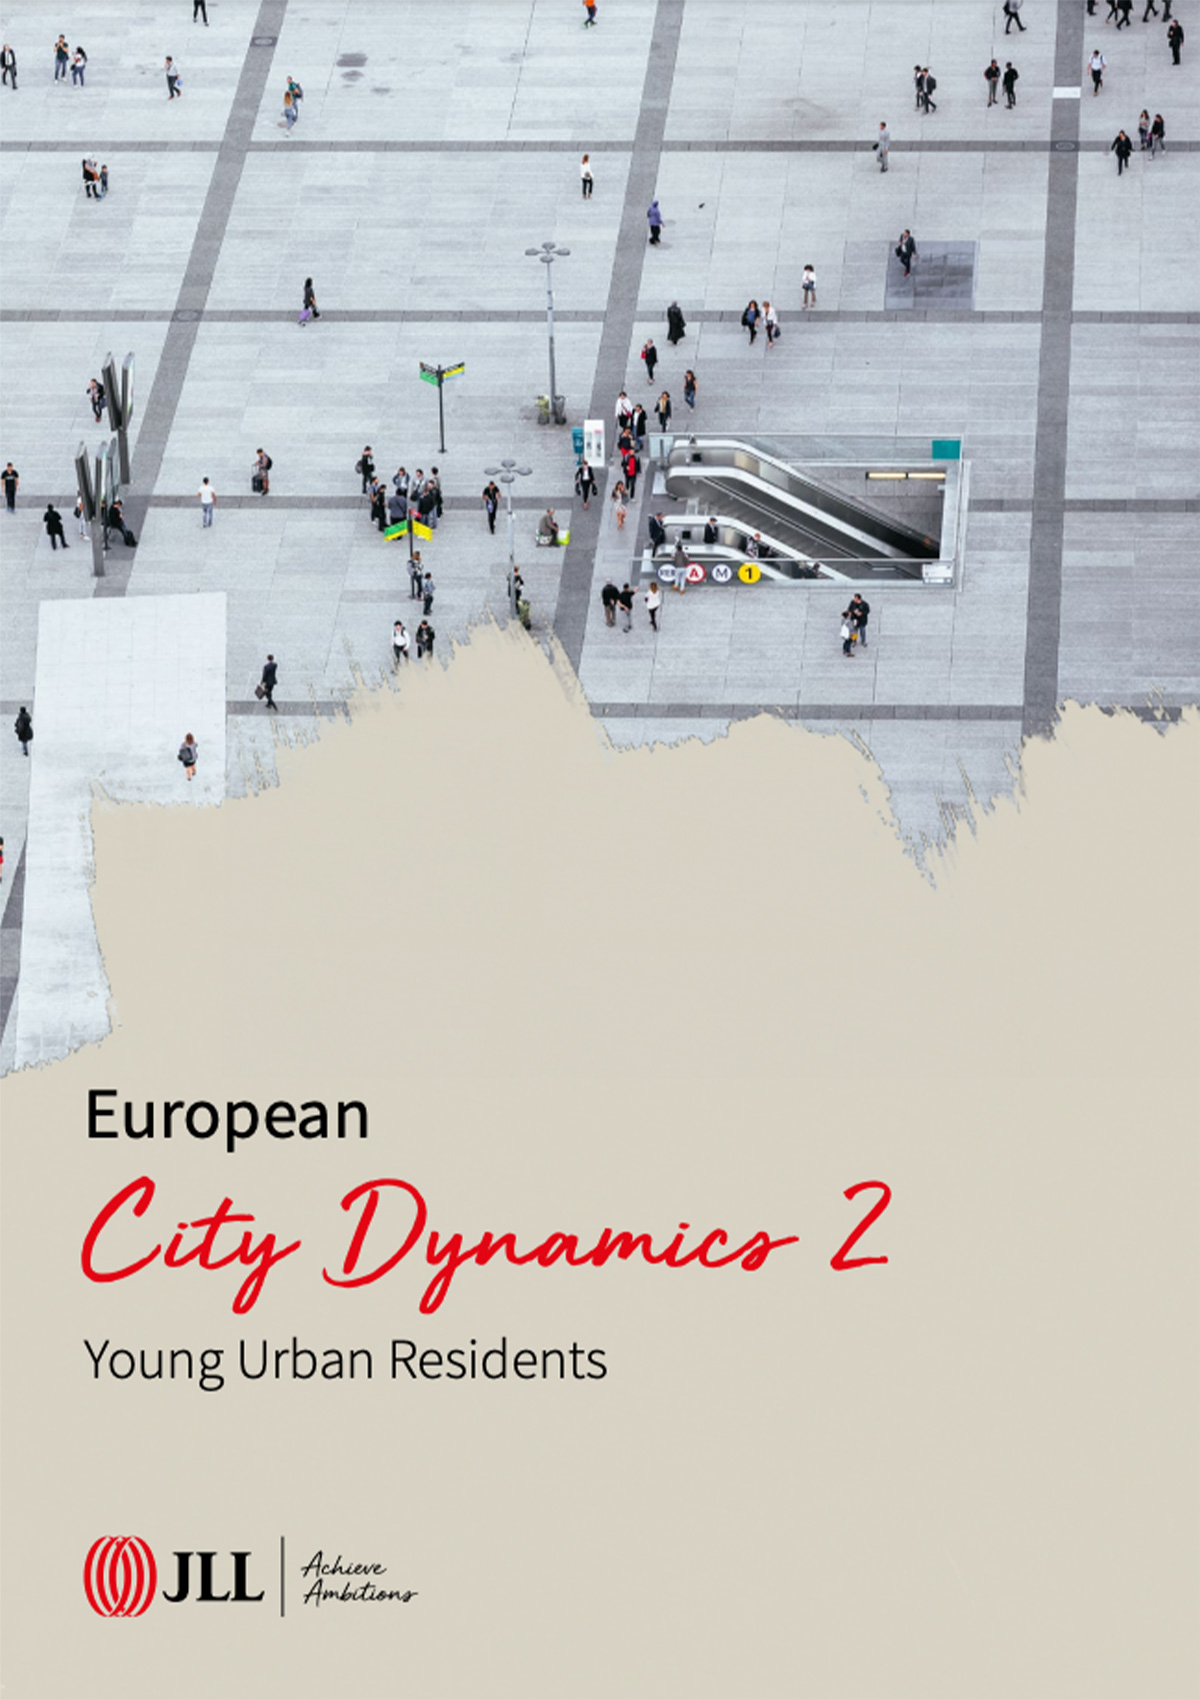 European City Dynamics